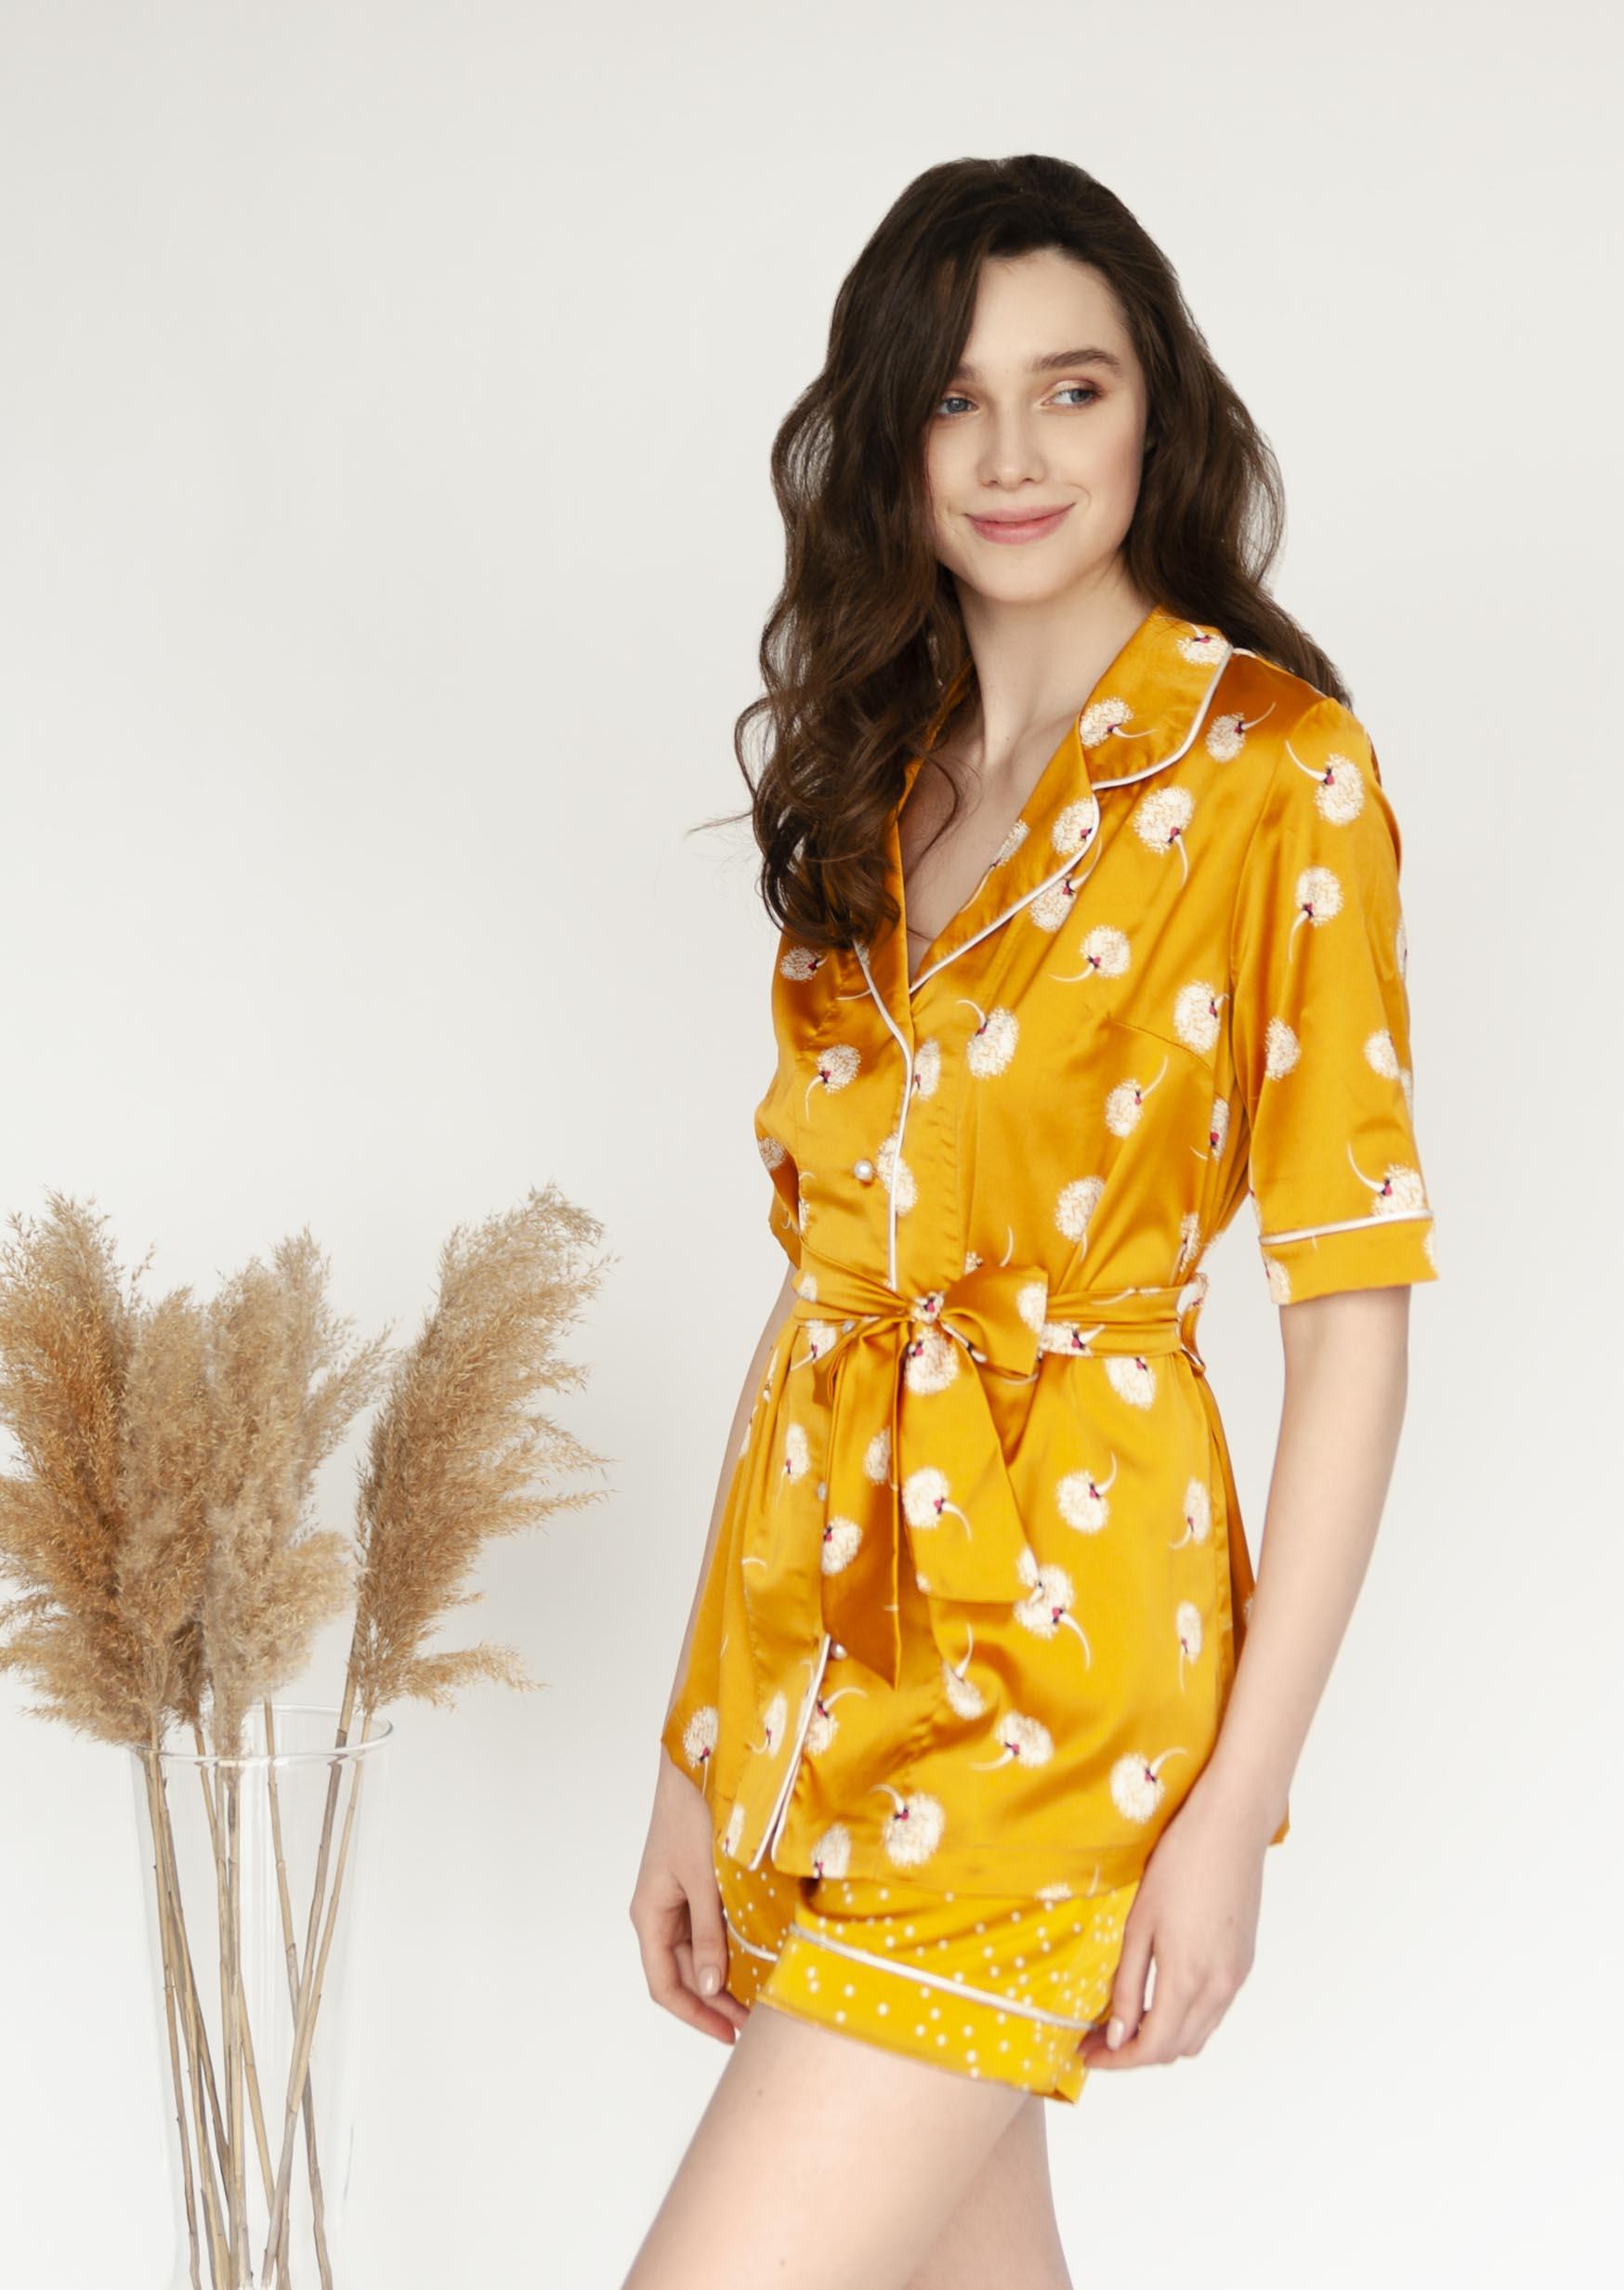 Marigold loungewear set orange satin pajama with buttons